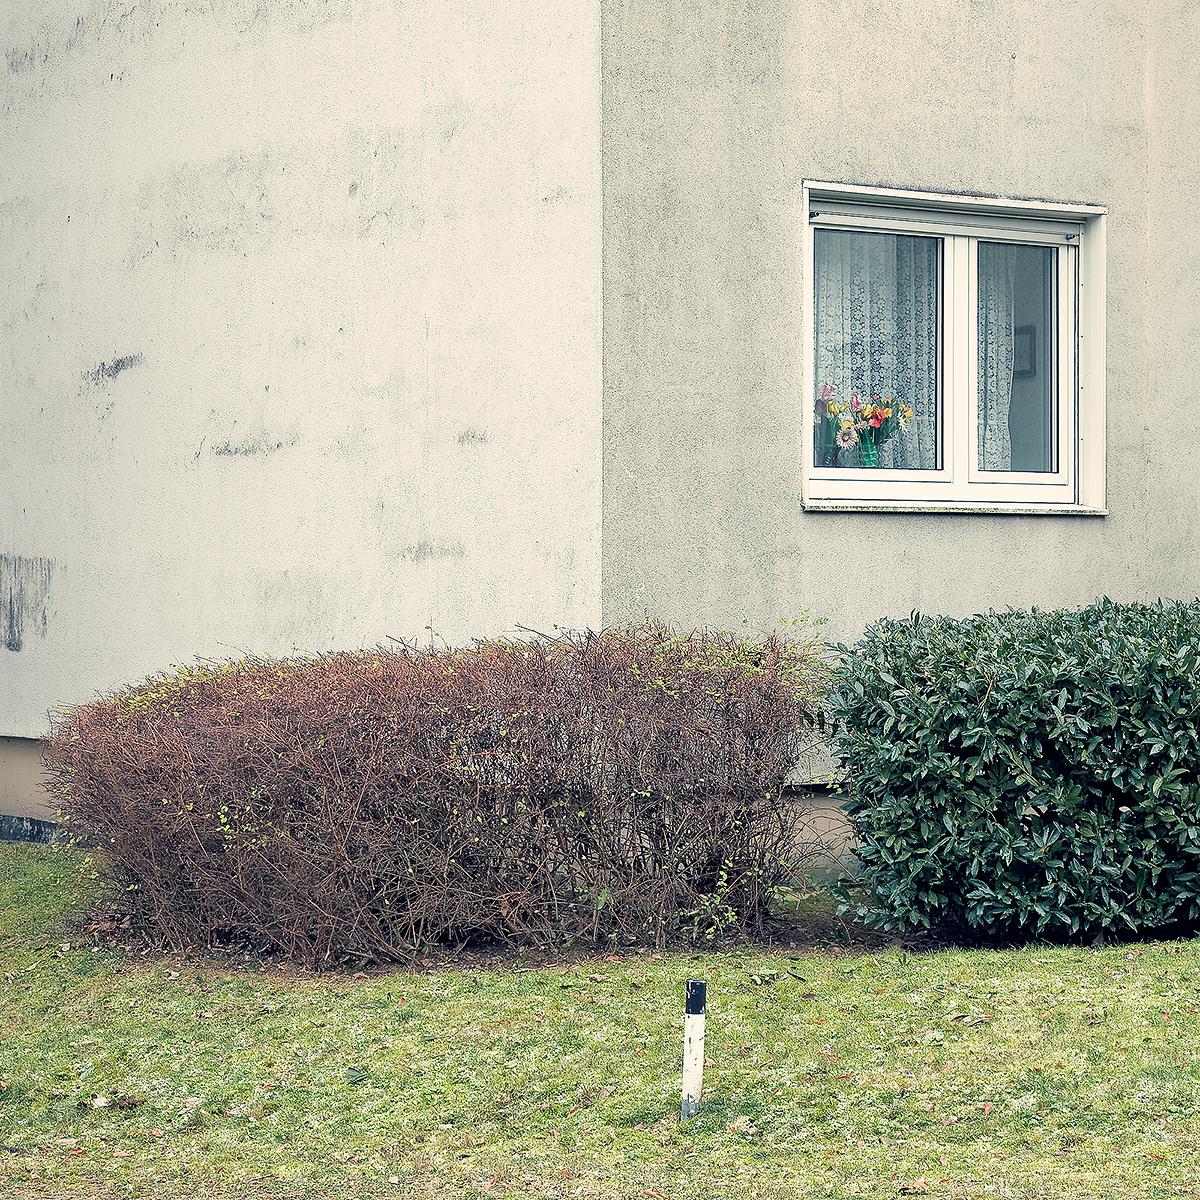 PeterBraunholz_Ecken(Corners)_Ecke05.jpg